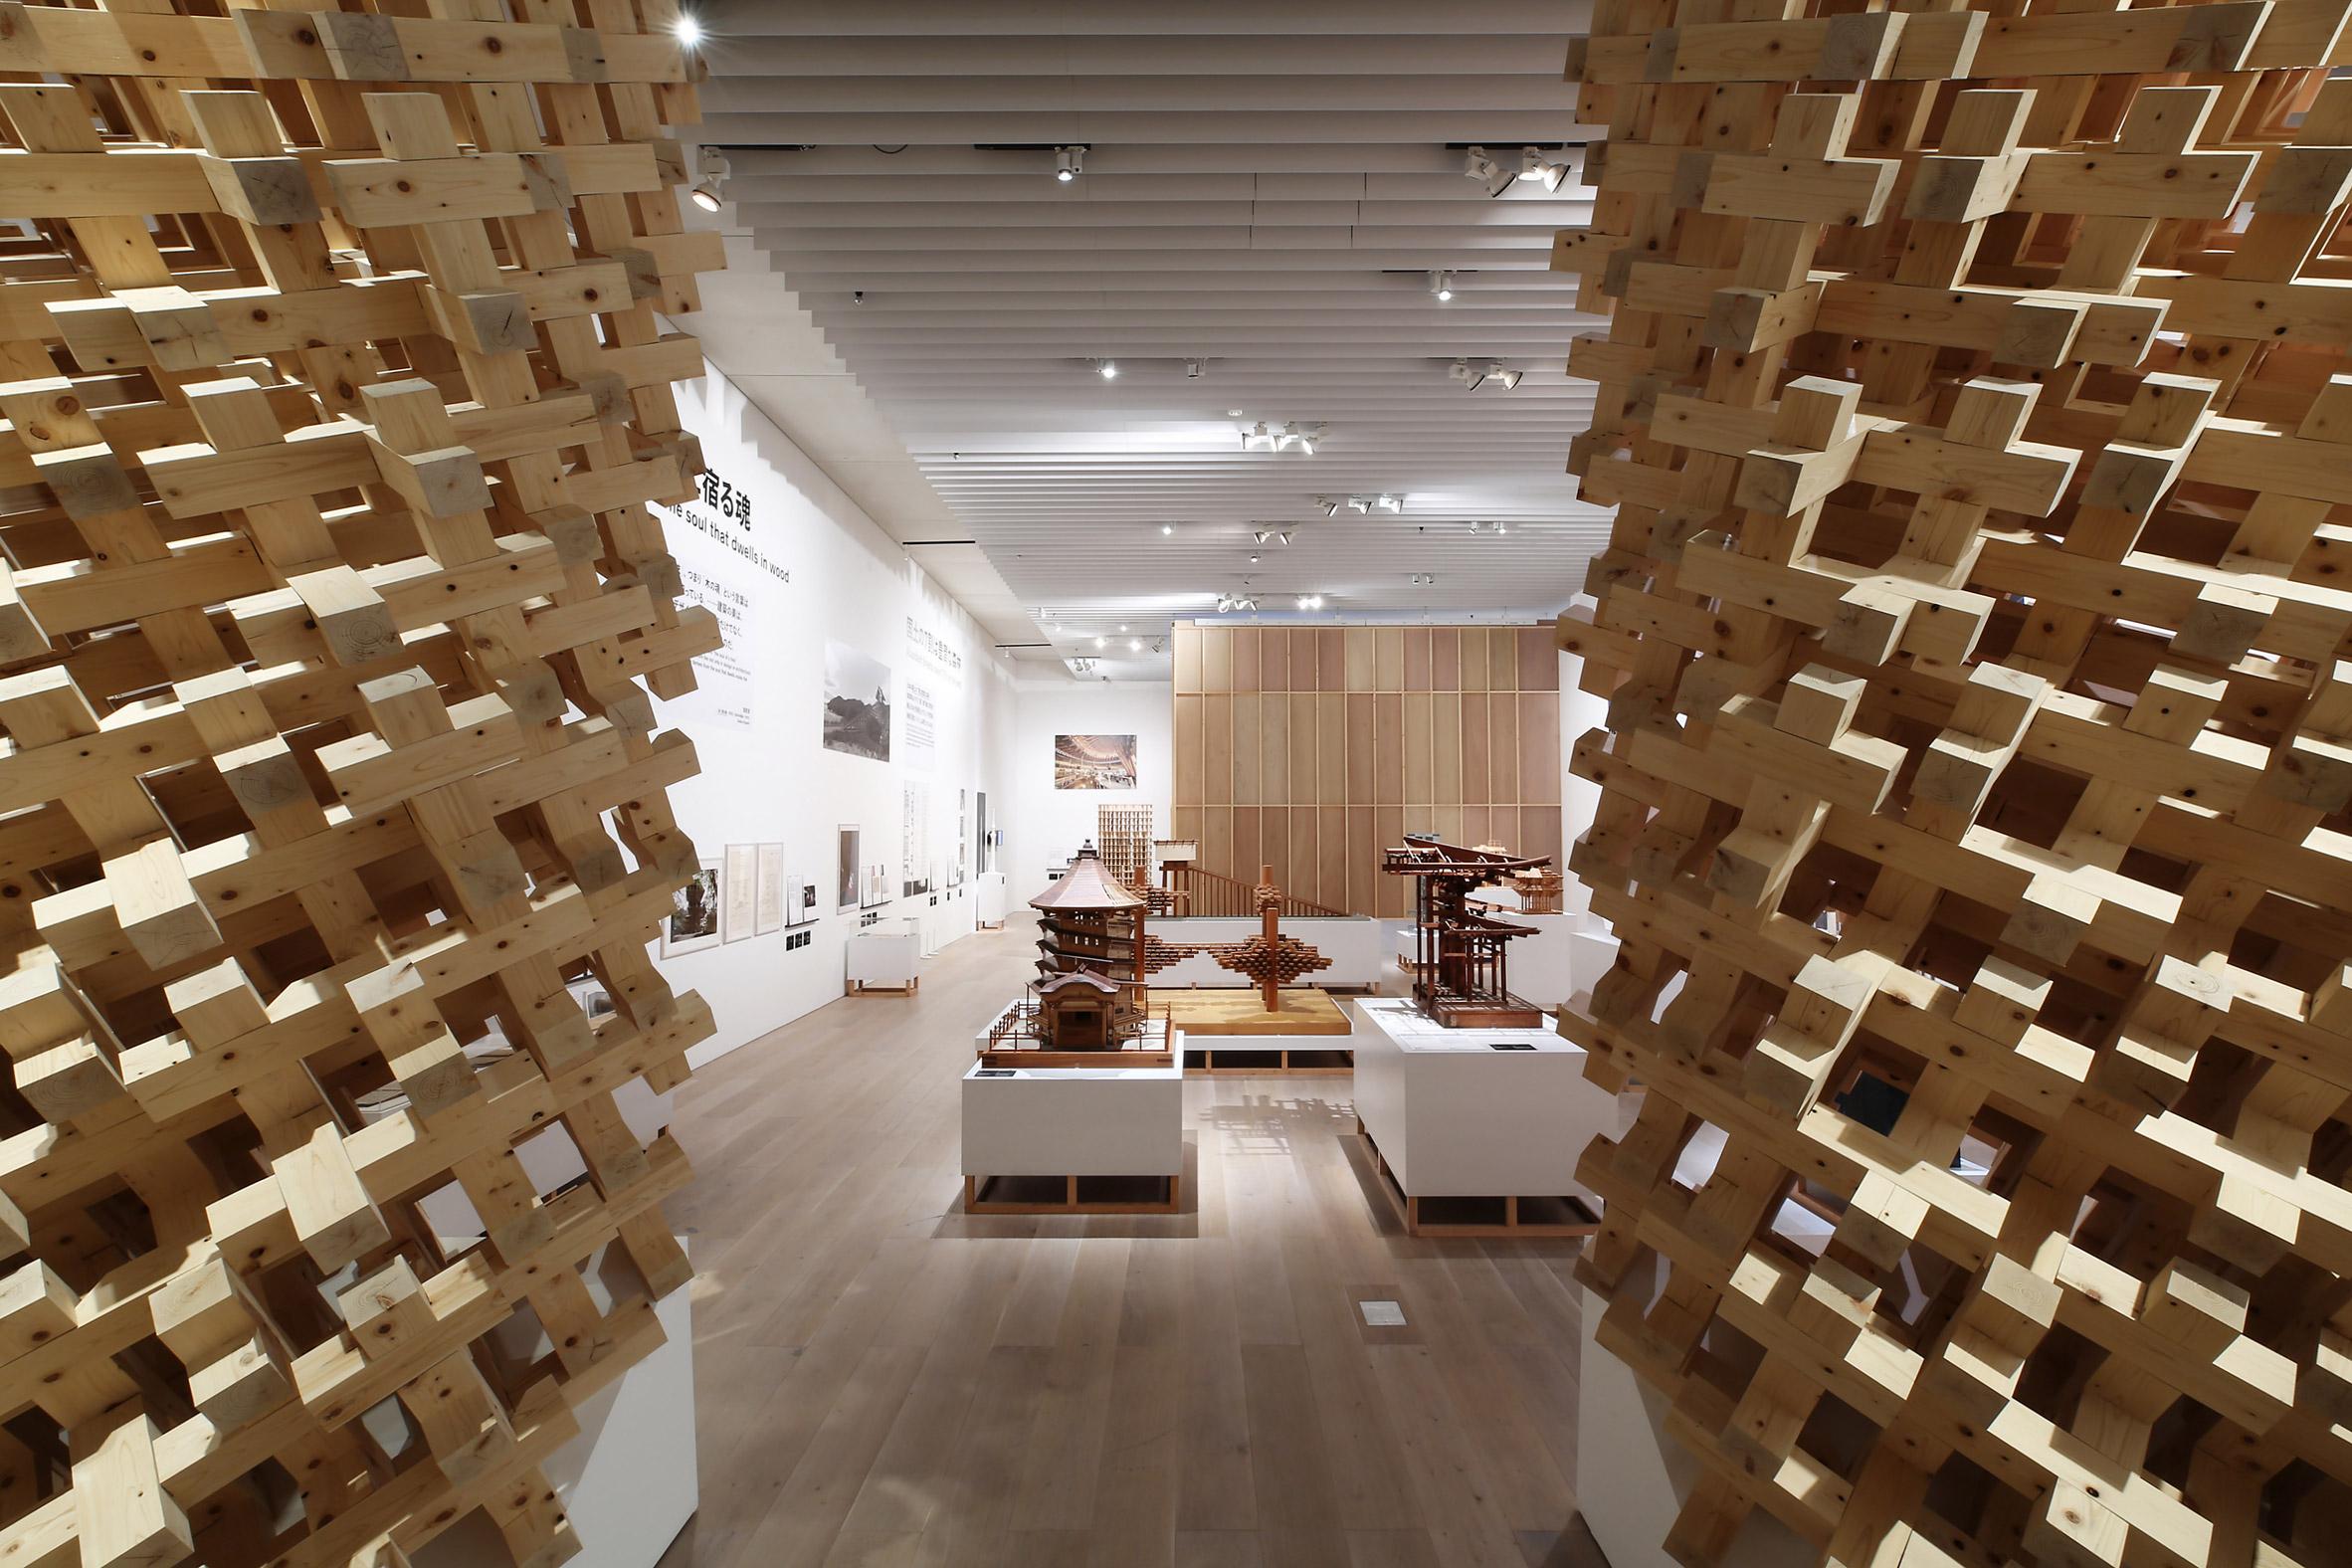 Japan in Architecture at Mori Art Museum, photograph by Koroda Takeru